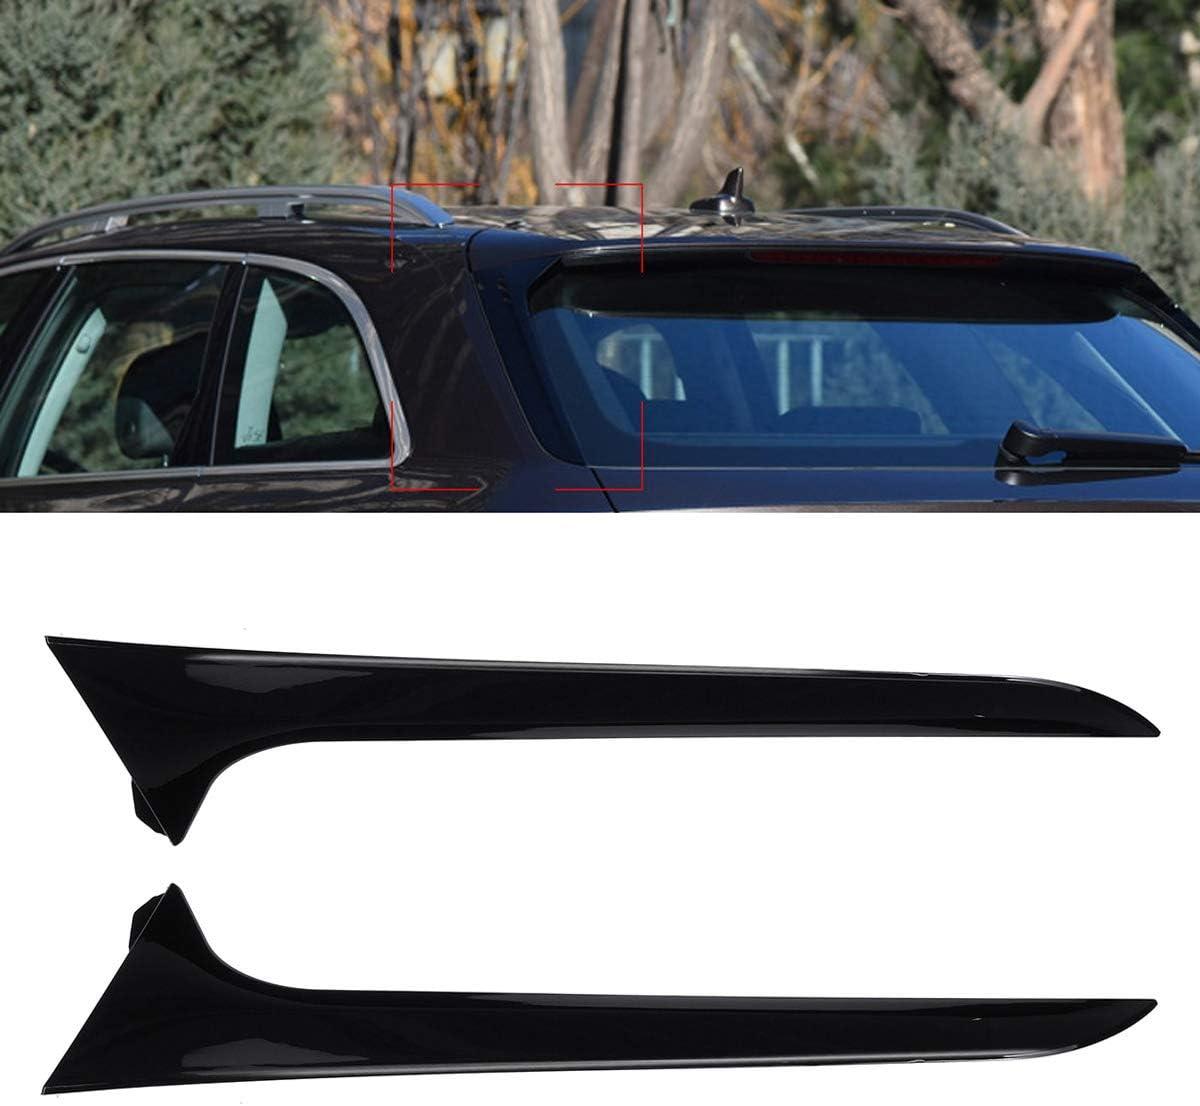 PeroFors Car Rear Window Side Spoiler Wing Canards Splitter For Audi A6 C7 Allroad Tdi Quattro//Audi A6 C7 Avant 2012-2018